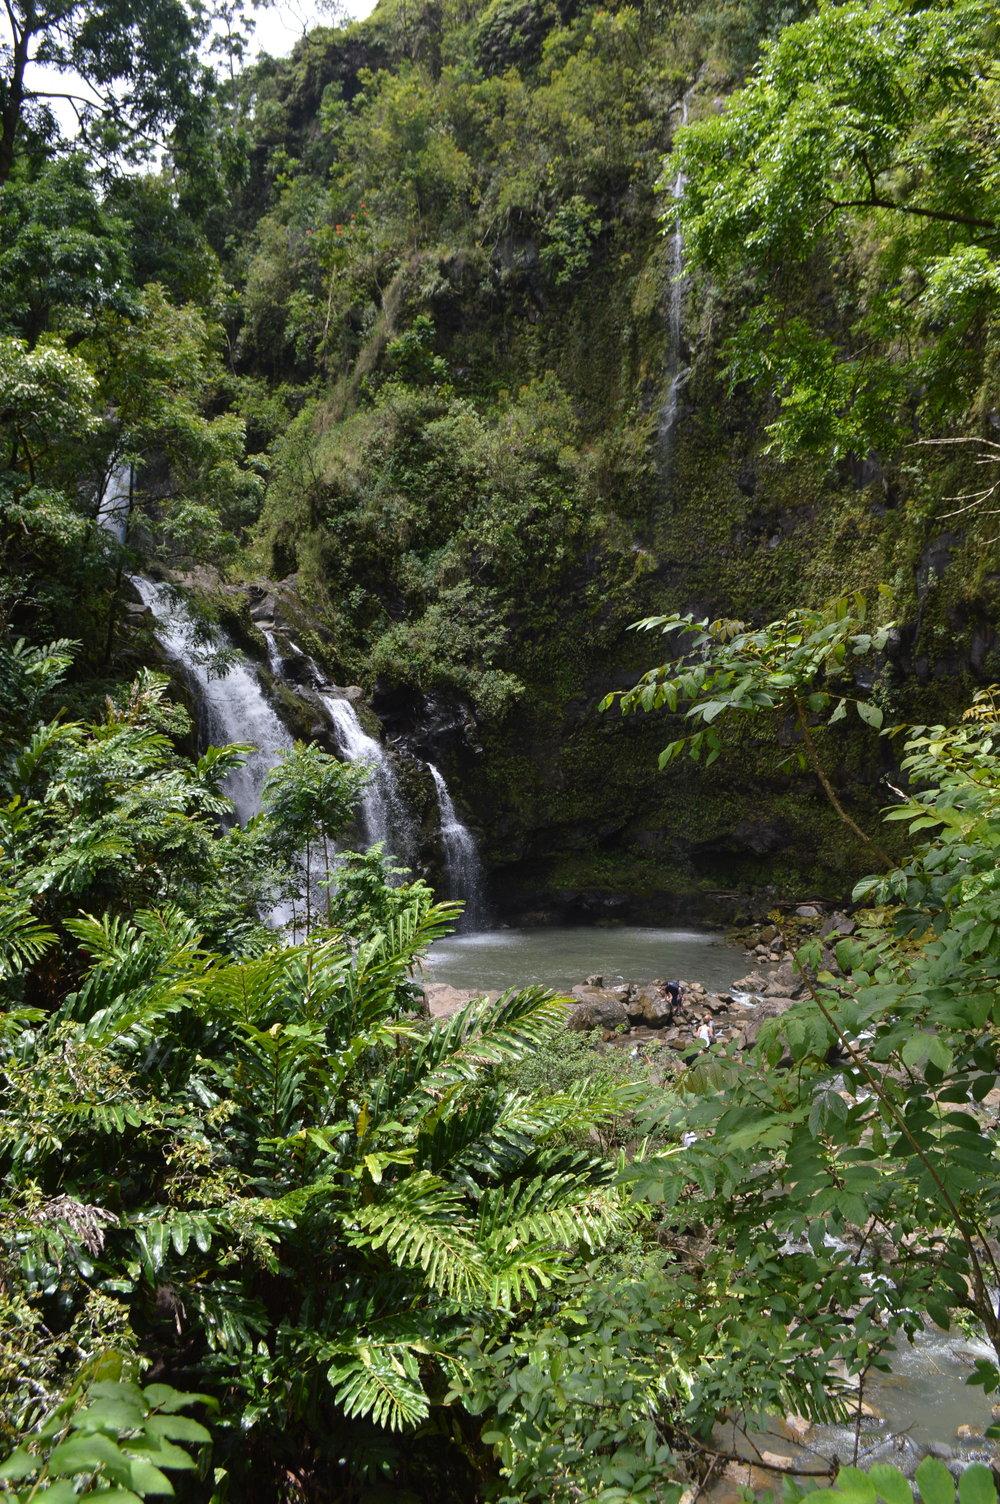 Maui - the garden isle